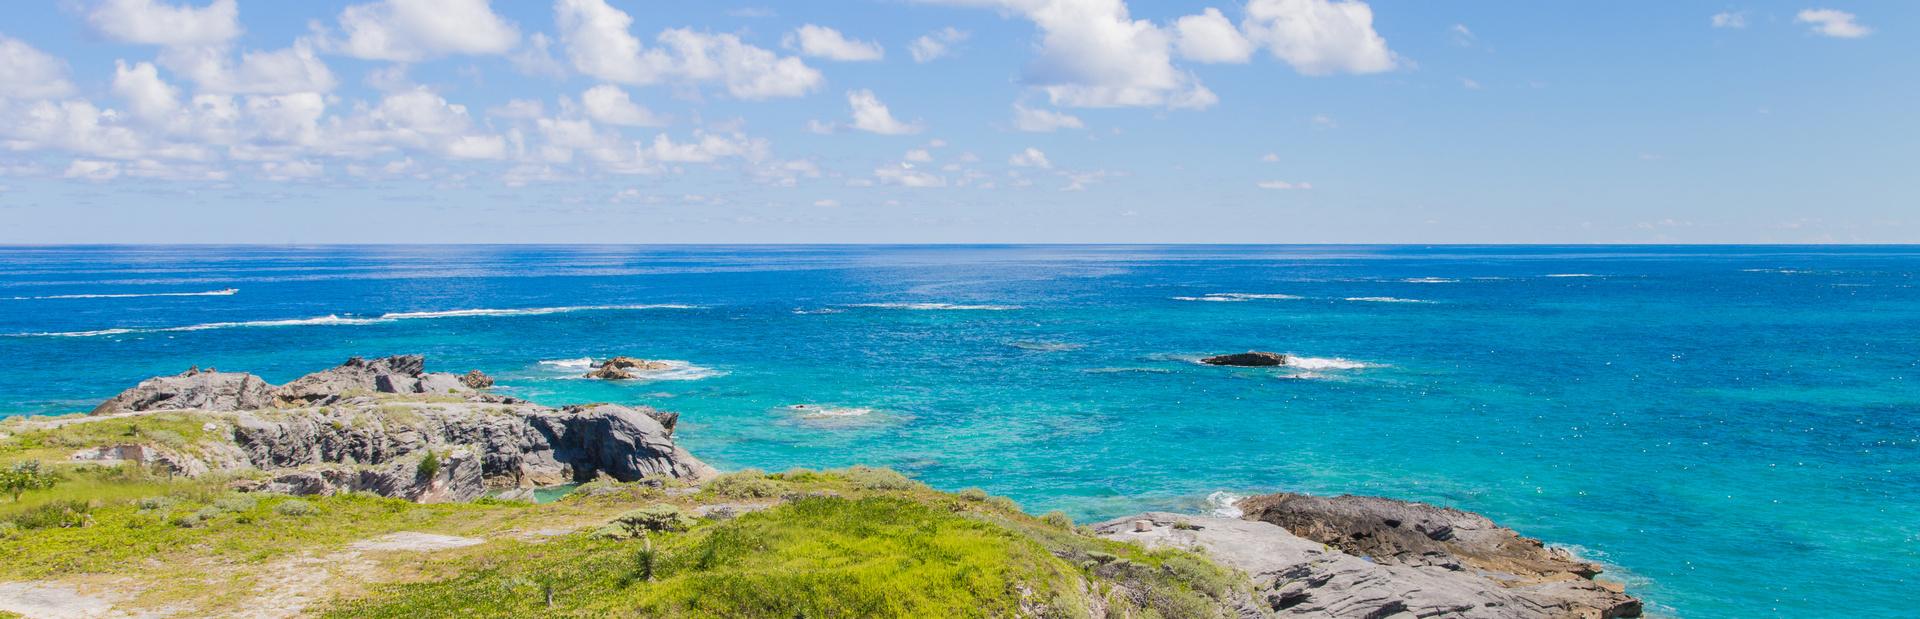 Cooper Island news photo